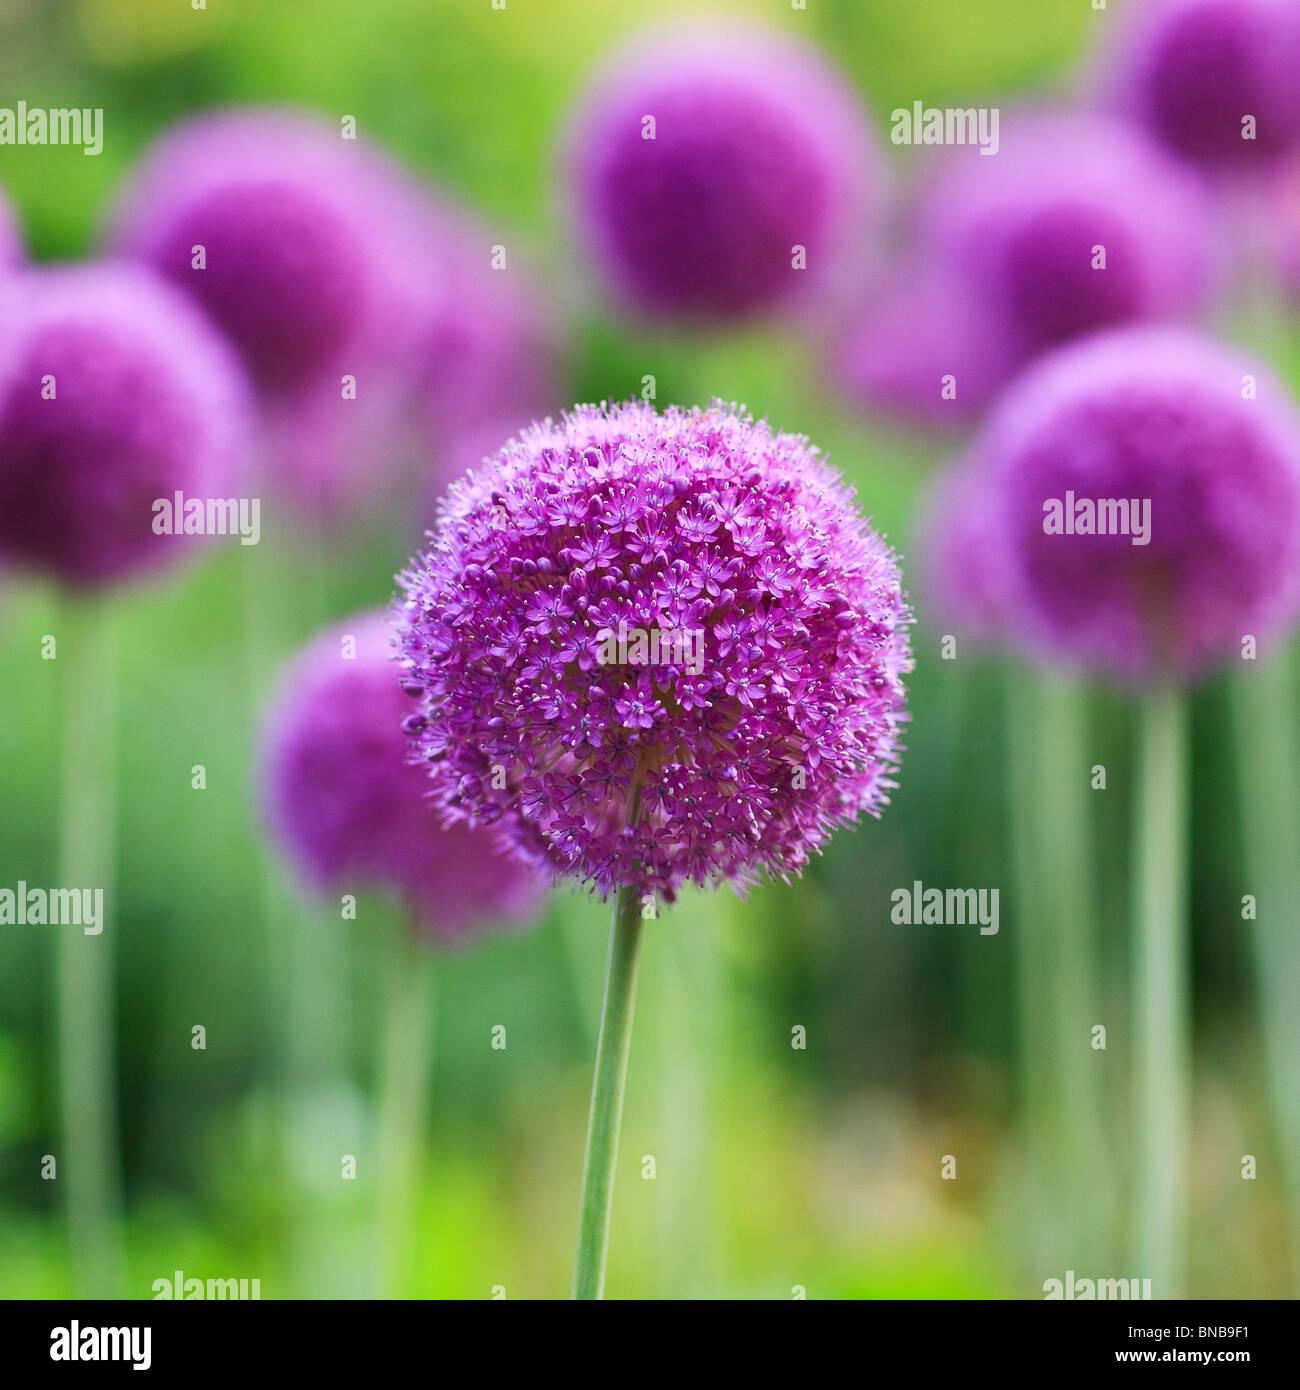 Viola Allium fiori, giardini inglesi, Assiniboine Park, Winnipeg, Manitoba, Canada. Immagini Stock